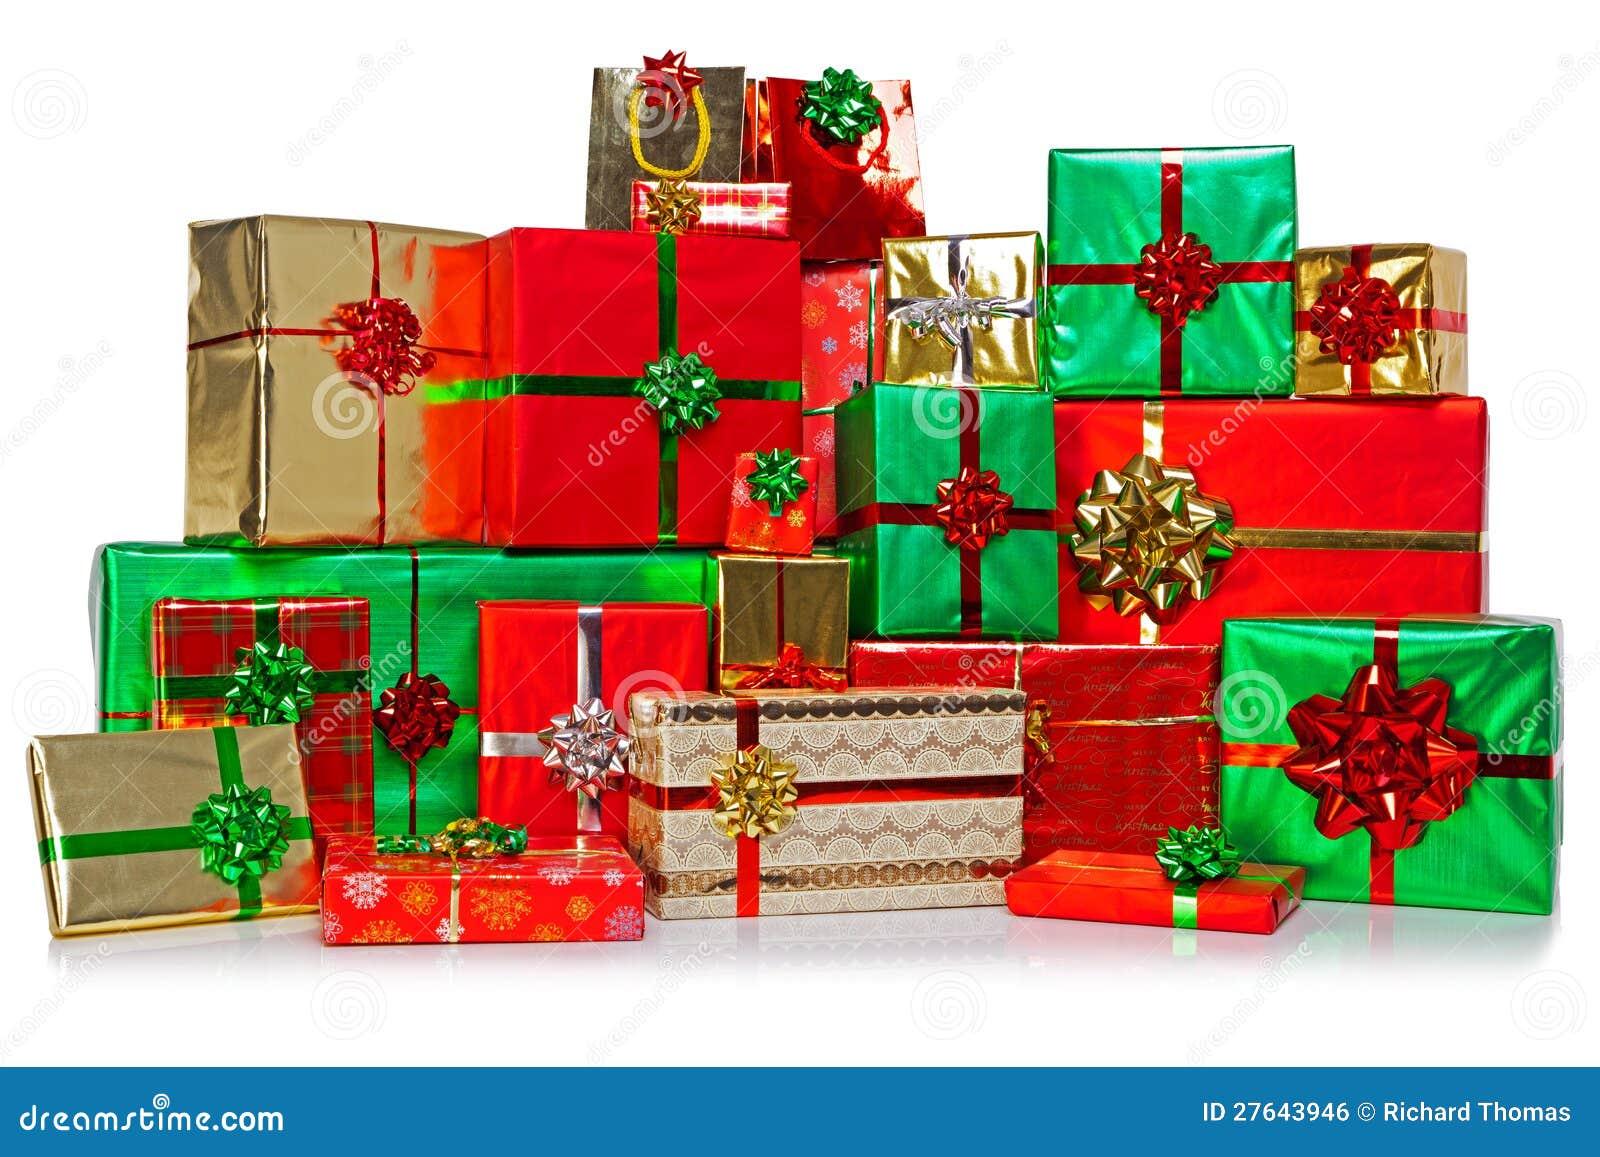 gro e gruppe weihnachtsgeschenke lizenzfreies stockbild. Black Bedroom Furniture Sets. Home Design Ideas